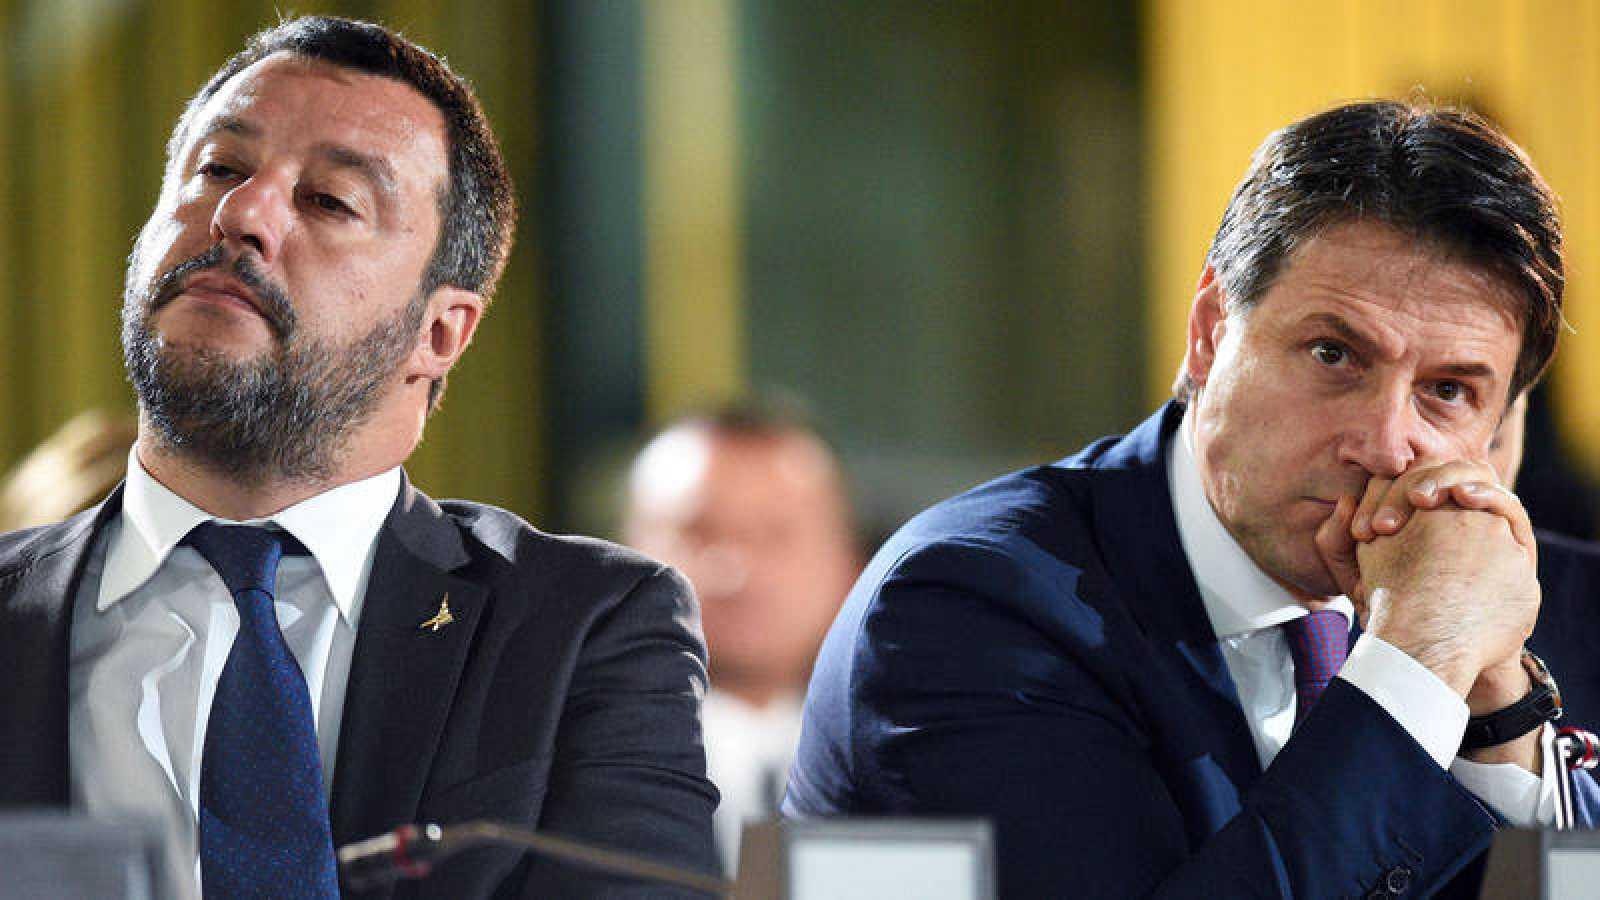 El ministro del Interior italiano, Matteo Salvini, y el primer ministro del país, Giuseppe Conte